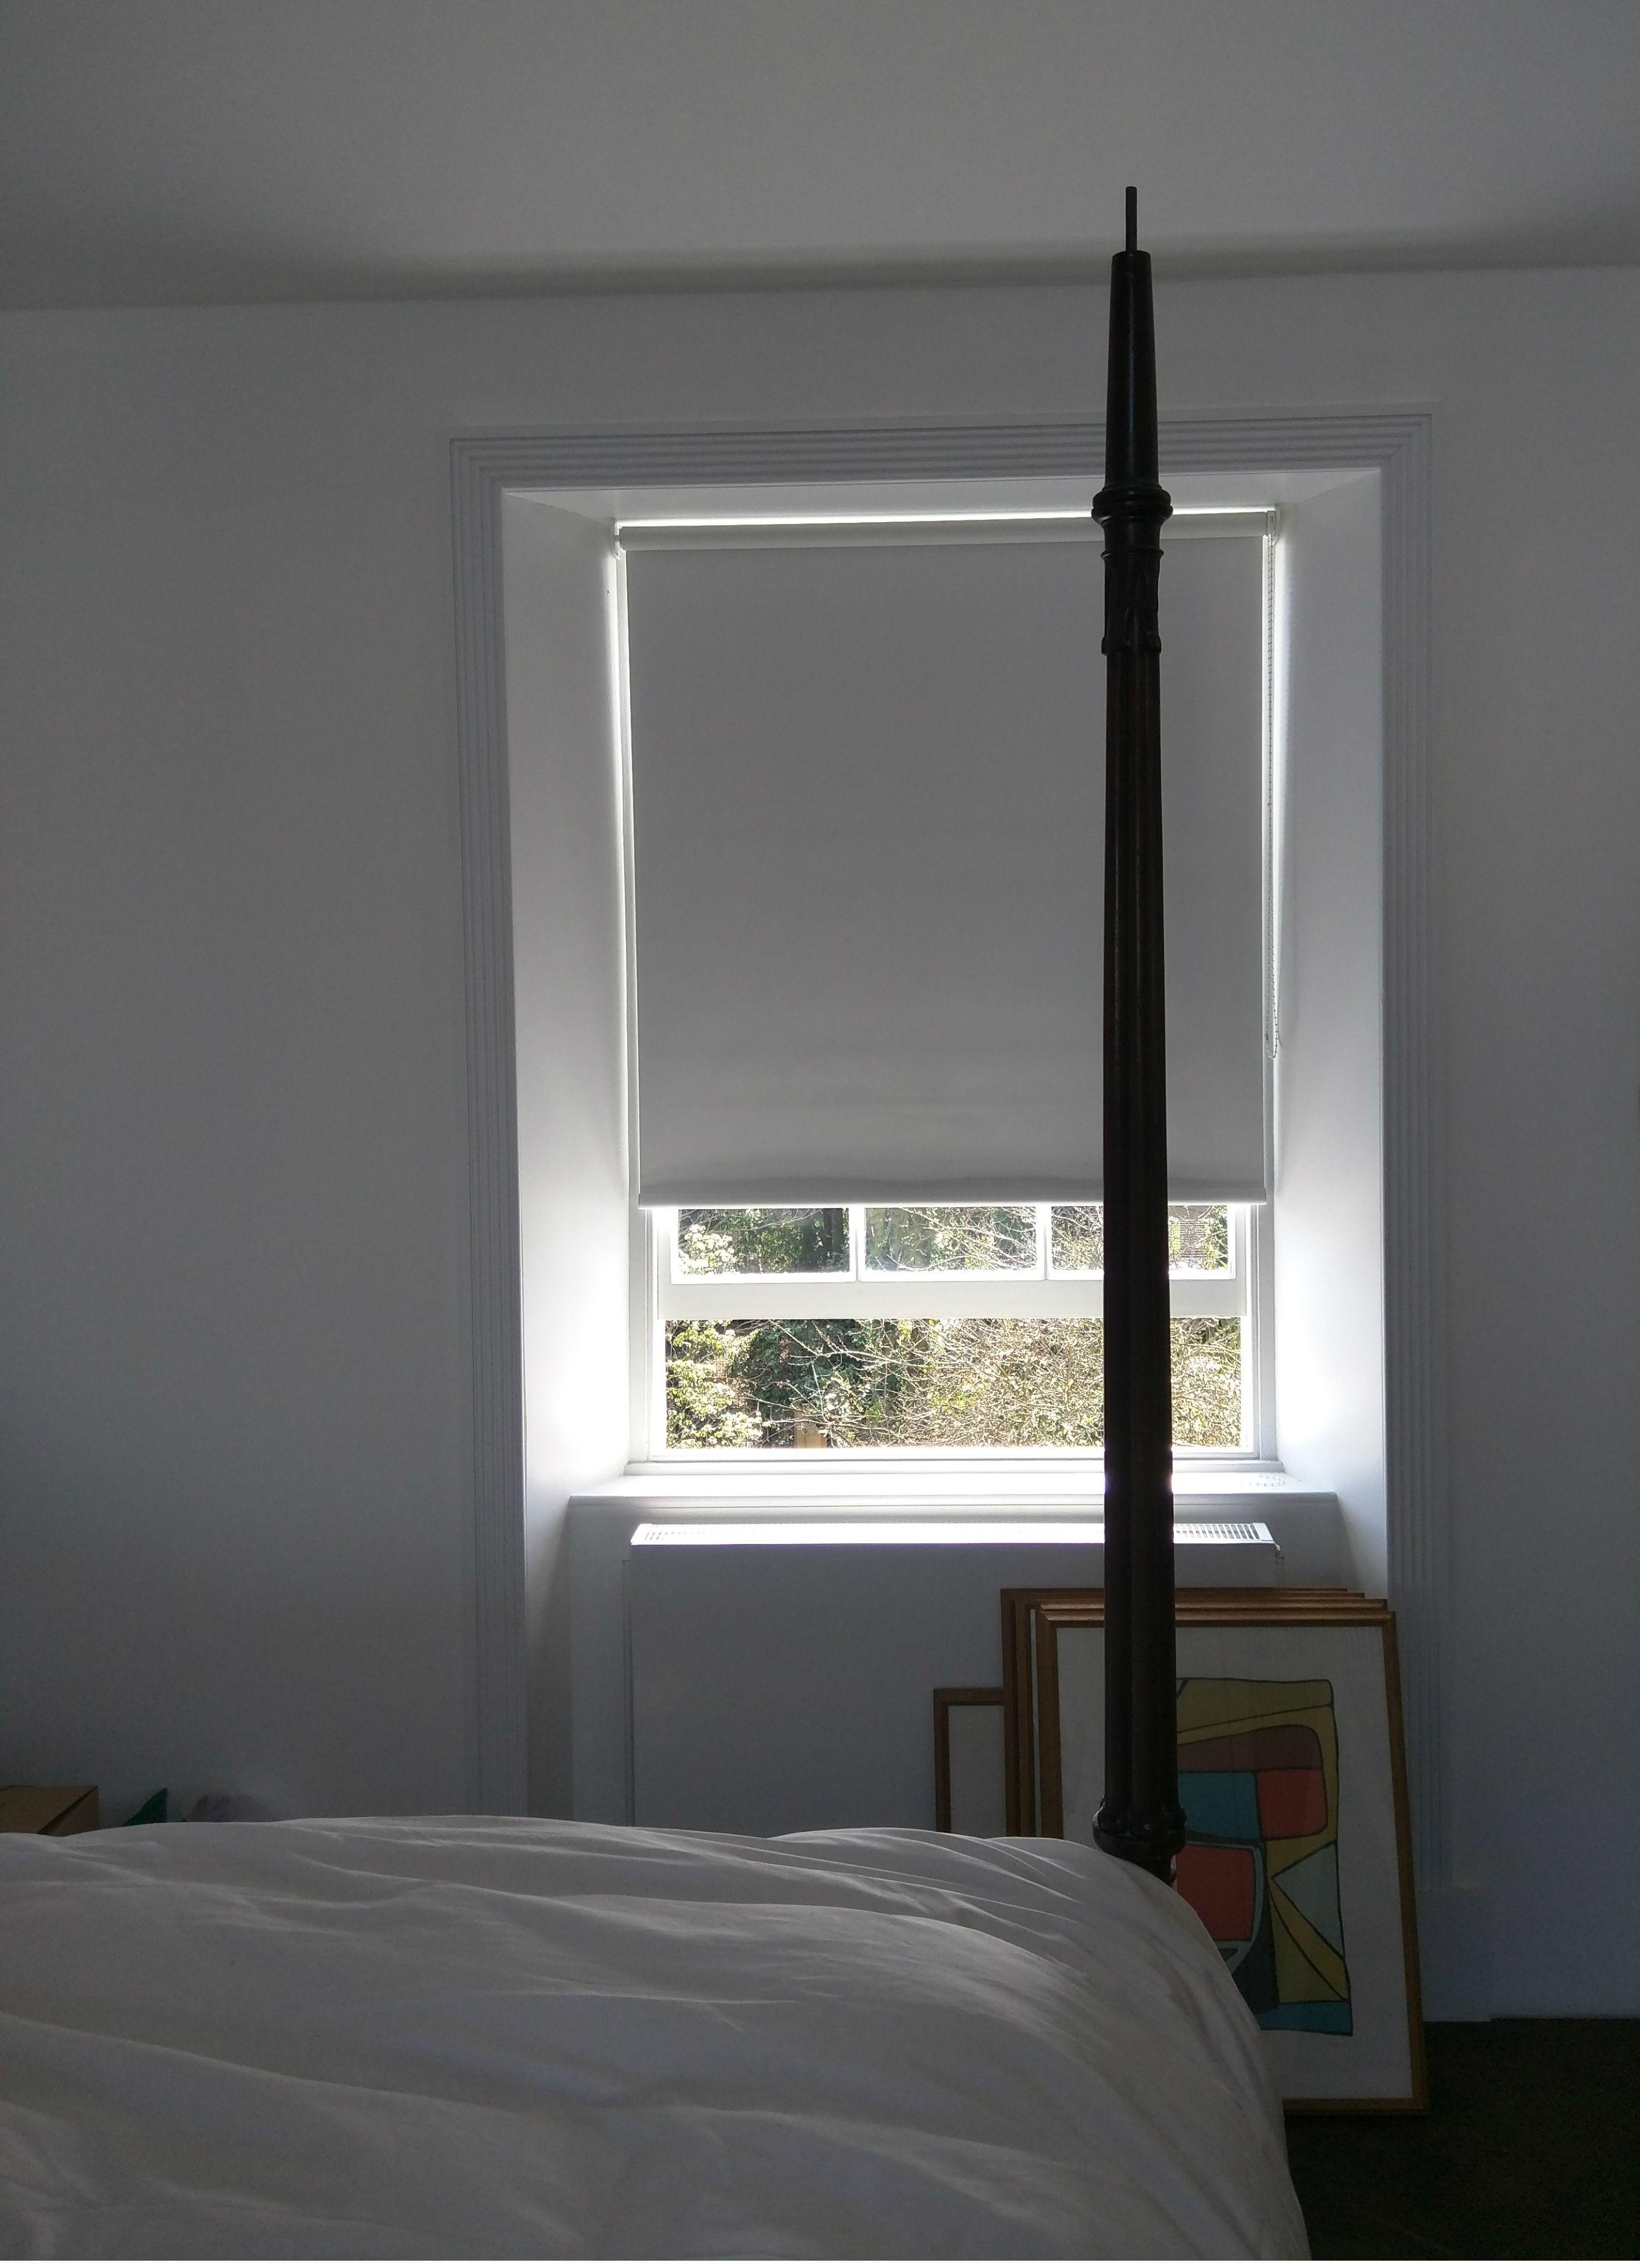 Blackout Bedroom Blinds Glamorous Blackout Roller Blind In Polar White  Bedroom Blind  Sash Window Decorating Design